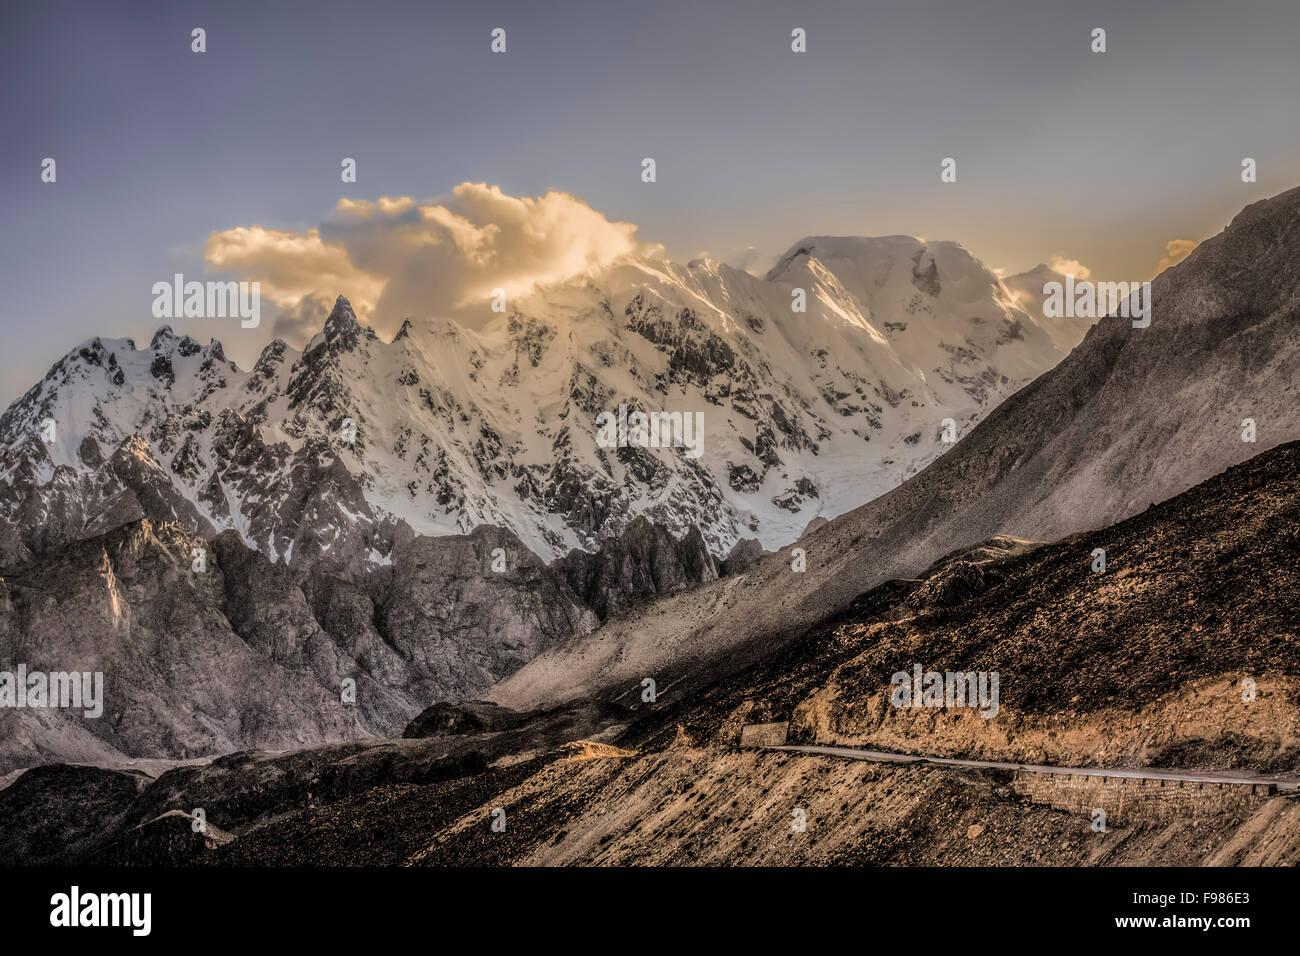 Mountains in the Karakoram Mountain range - Stock Image